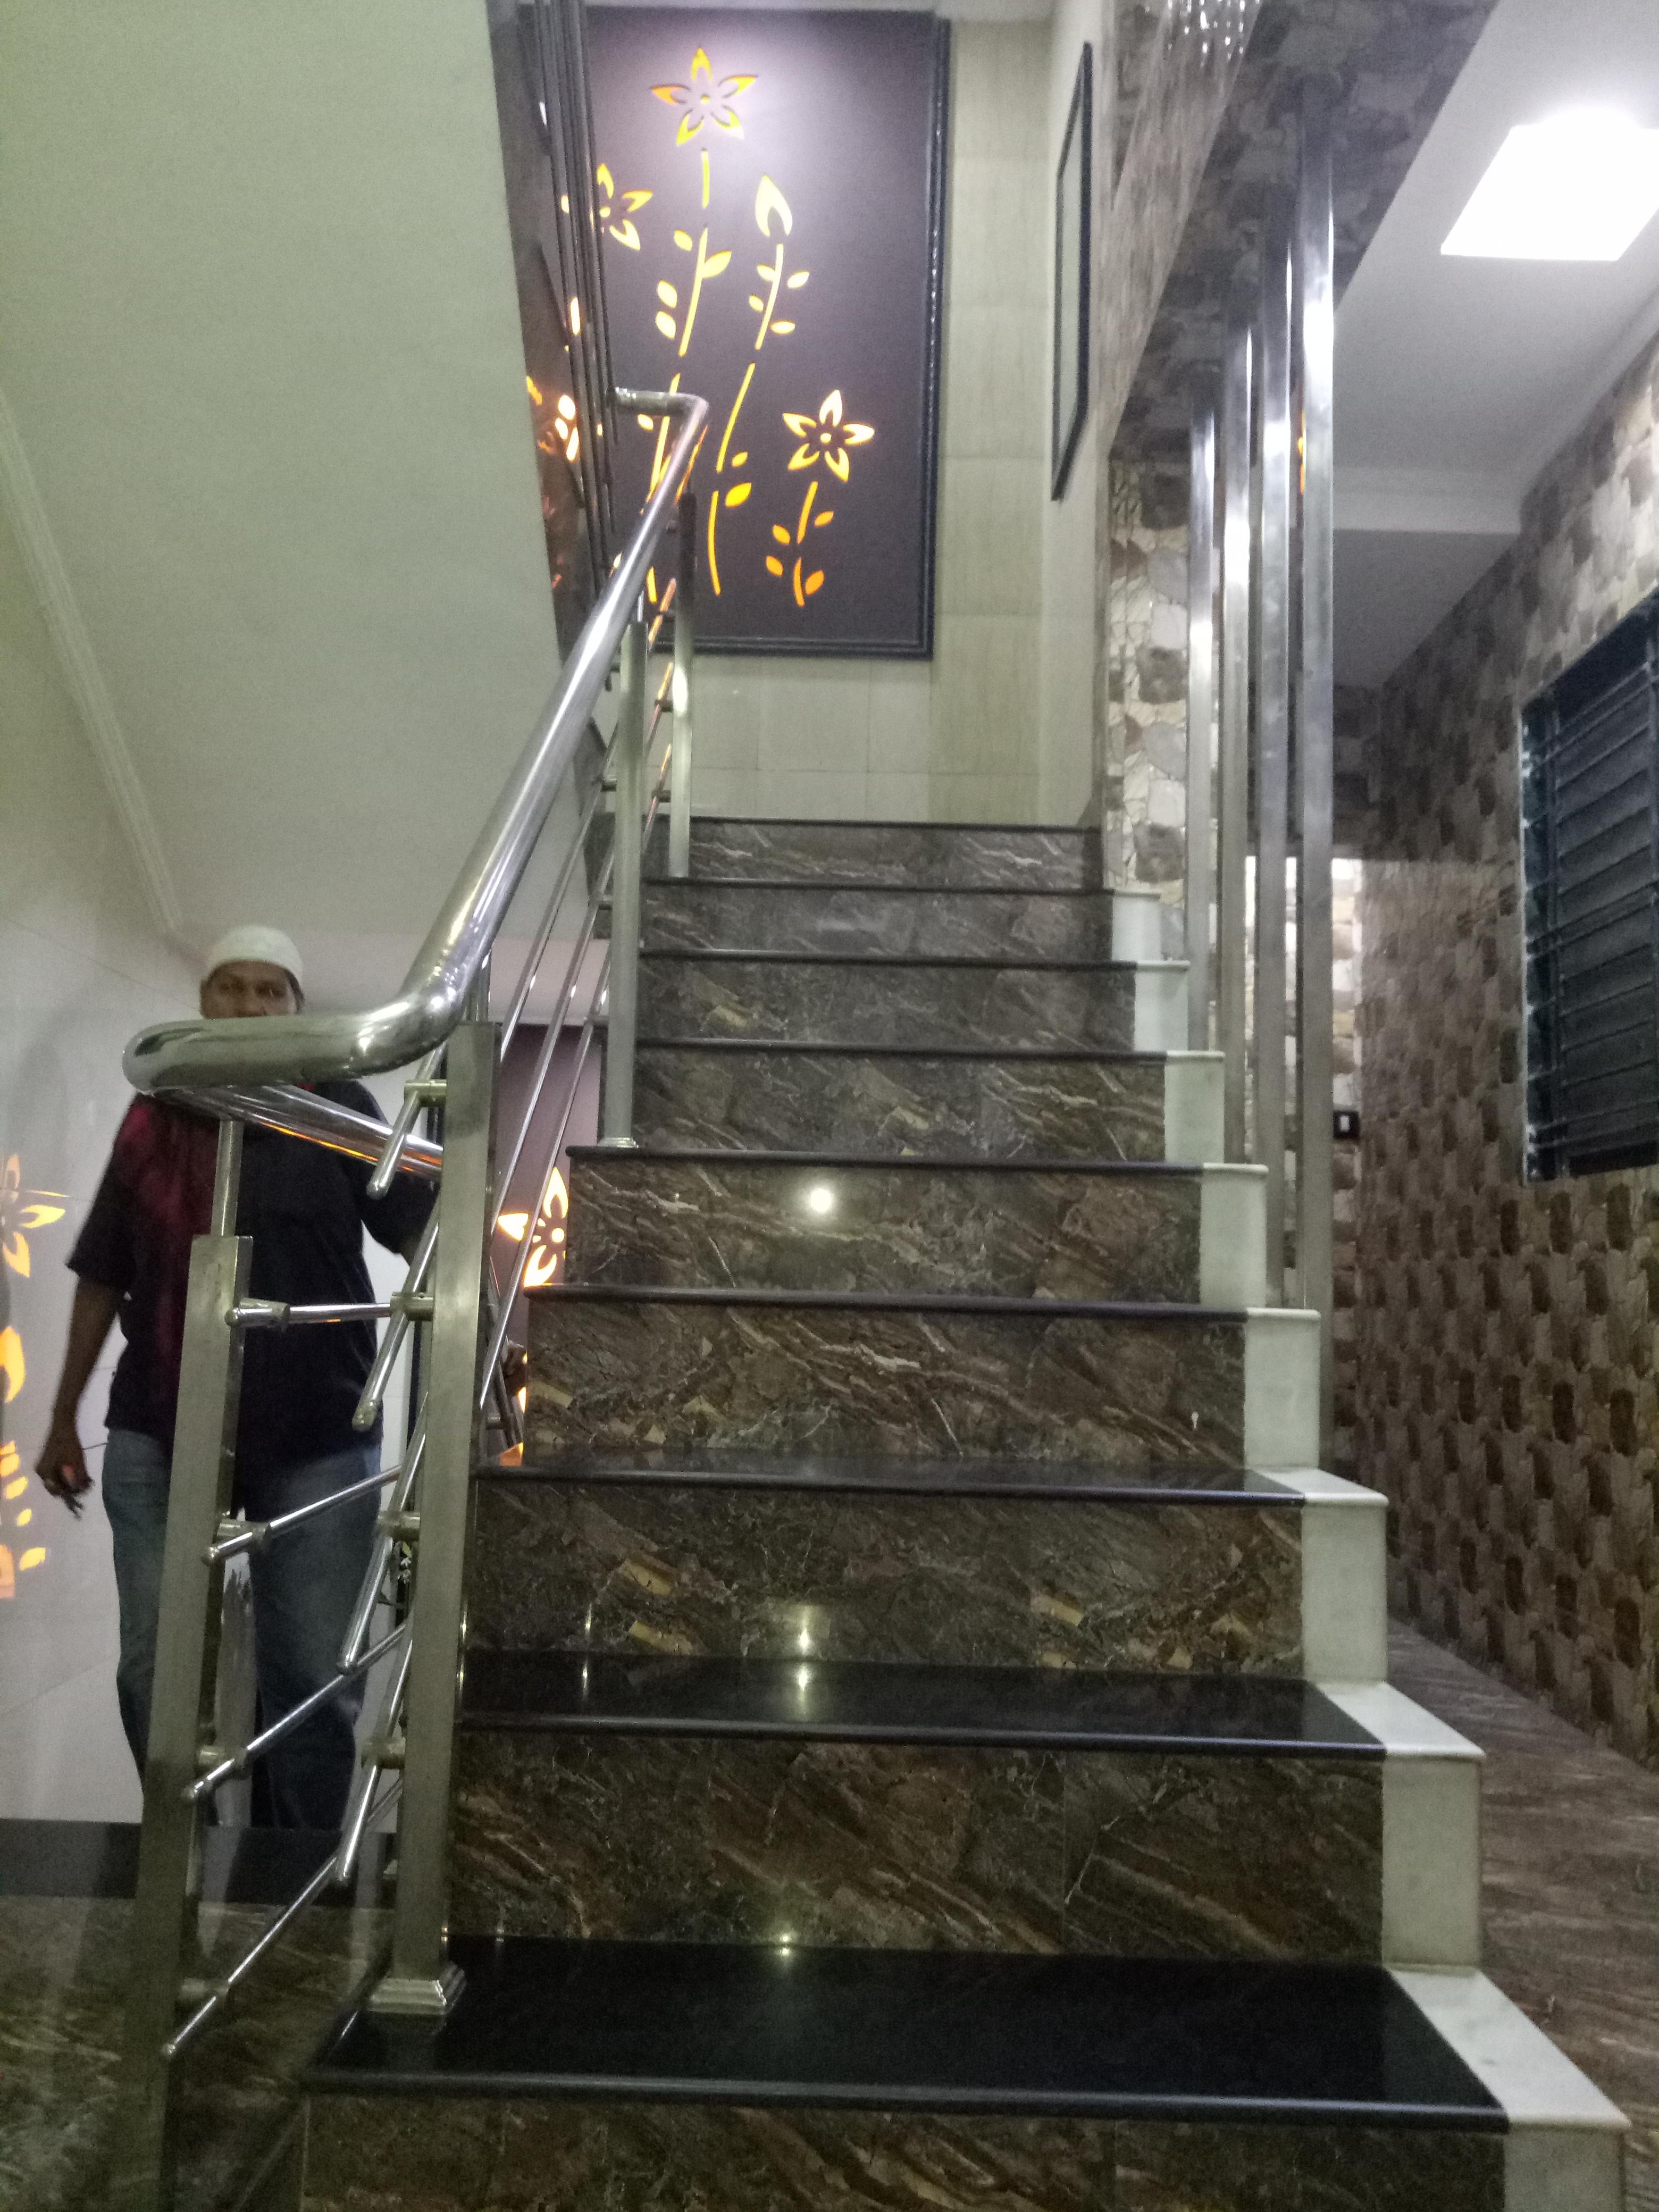 Hotel Tanishq Lodging_image2